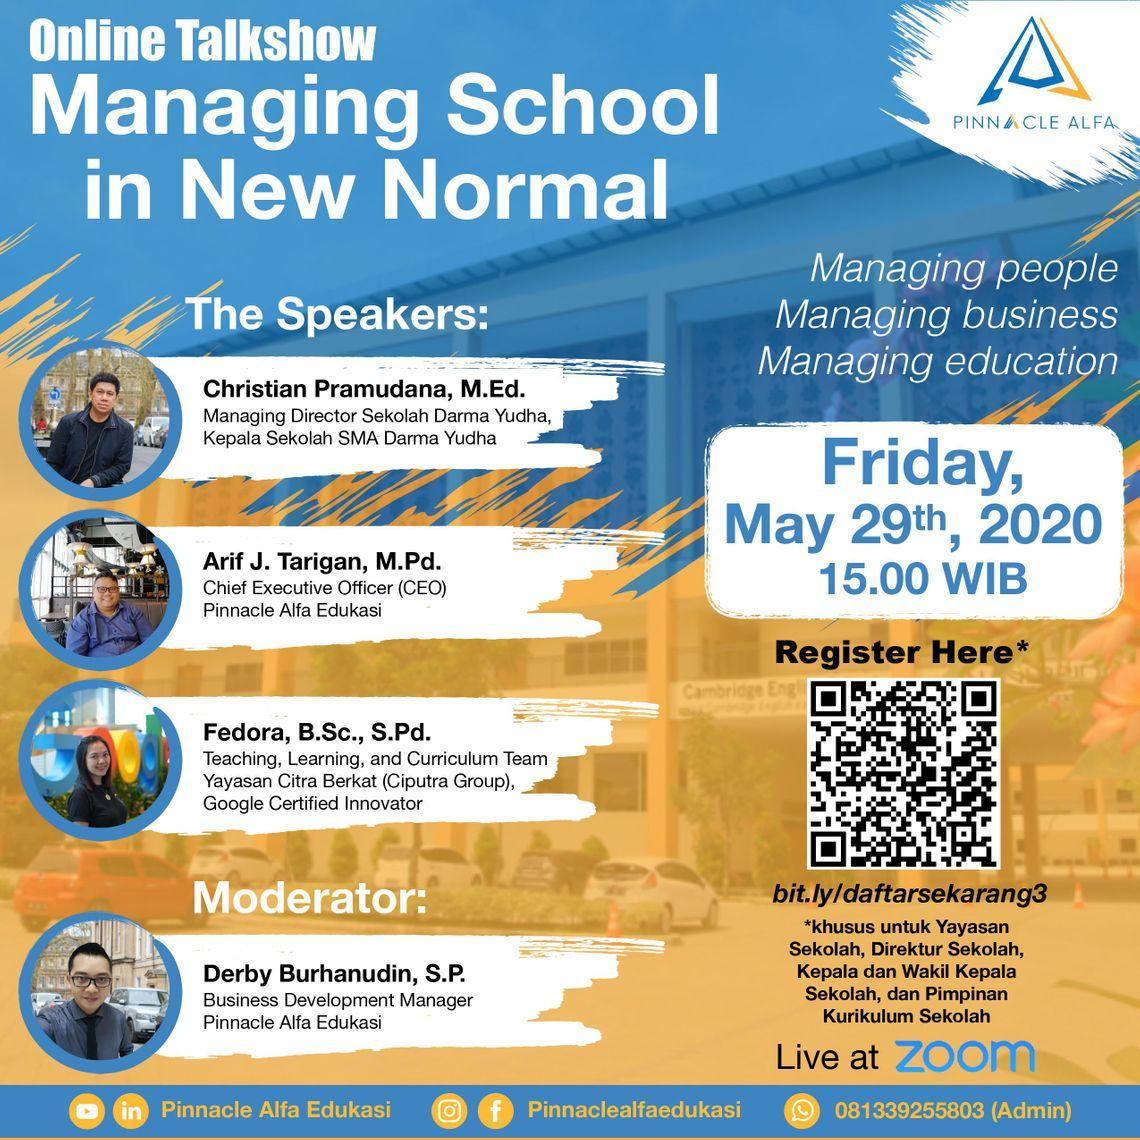 Managing School in New Normal